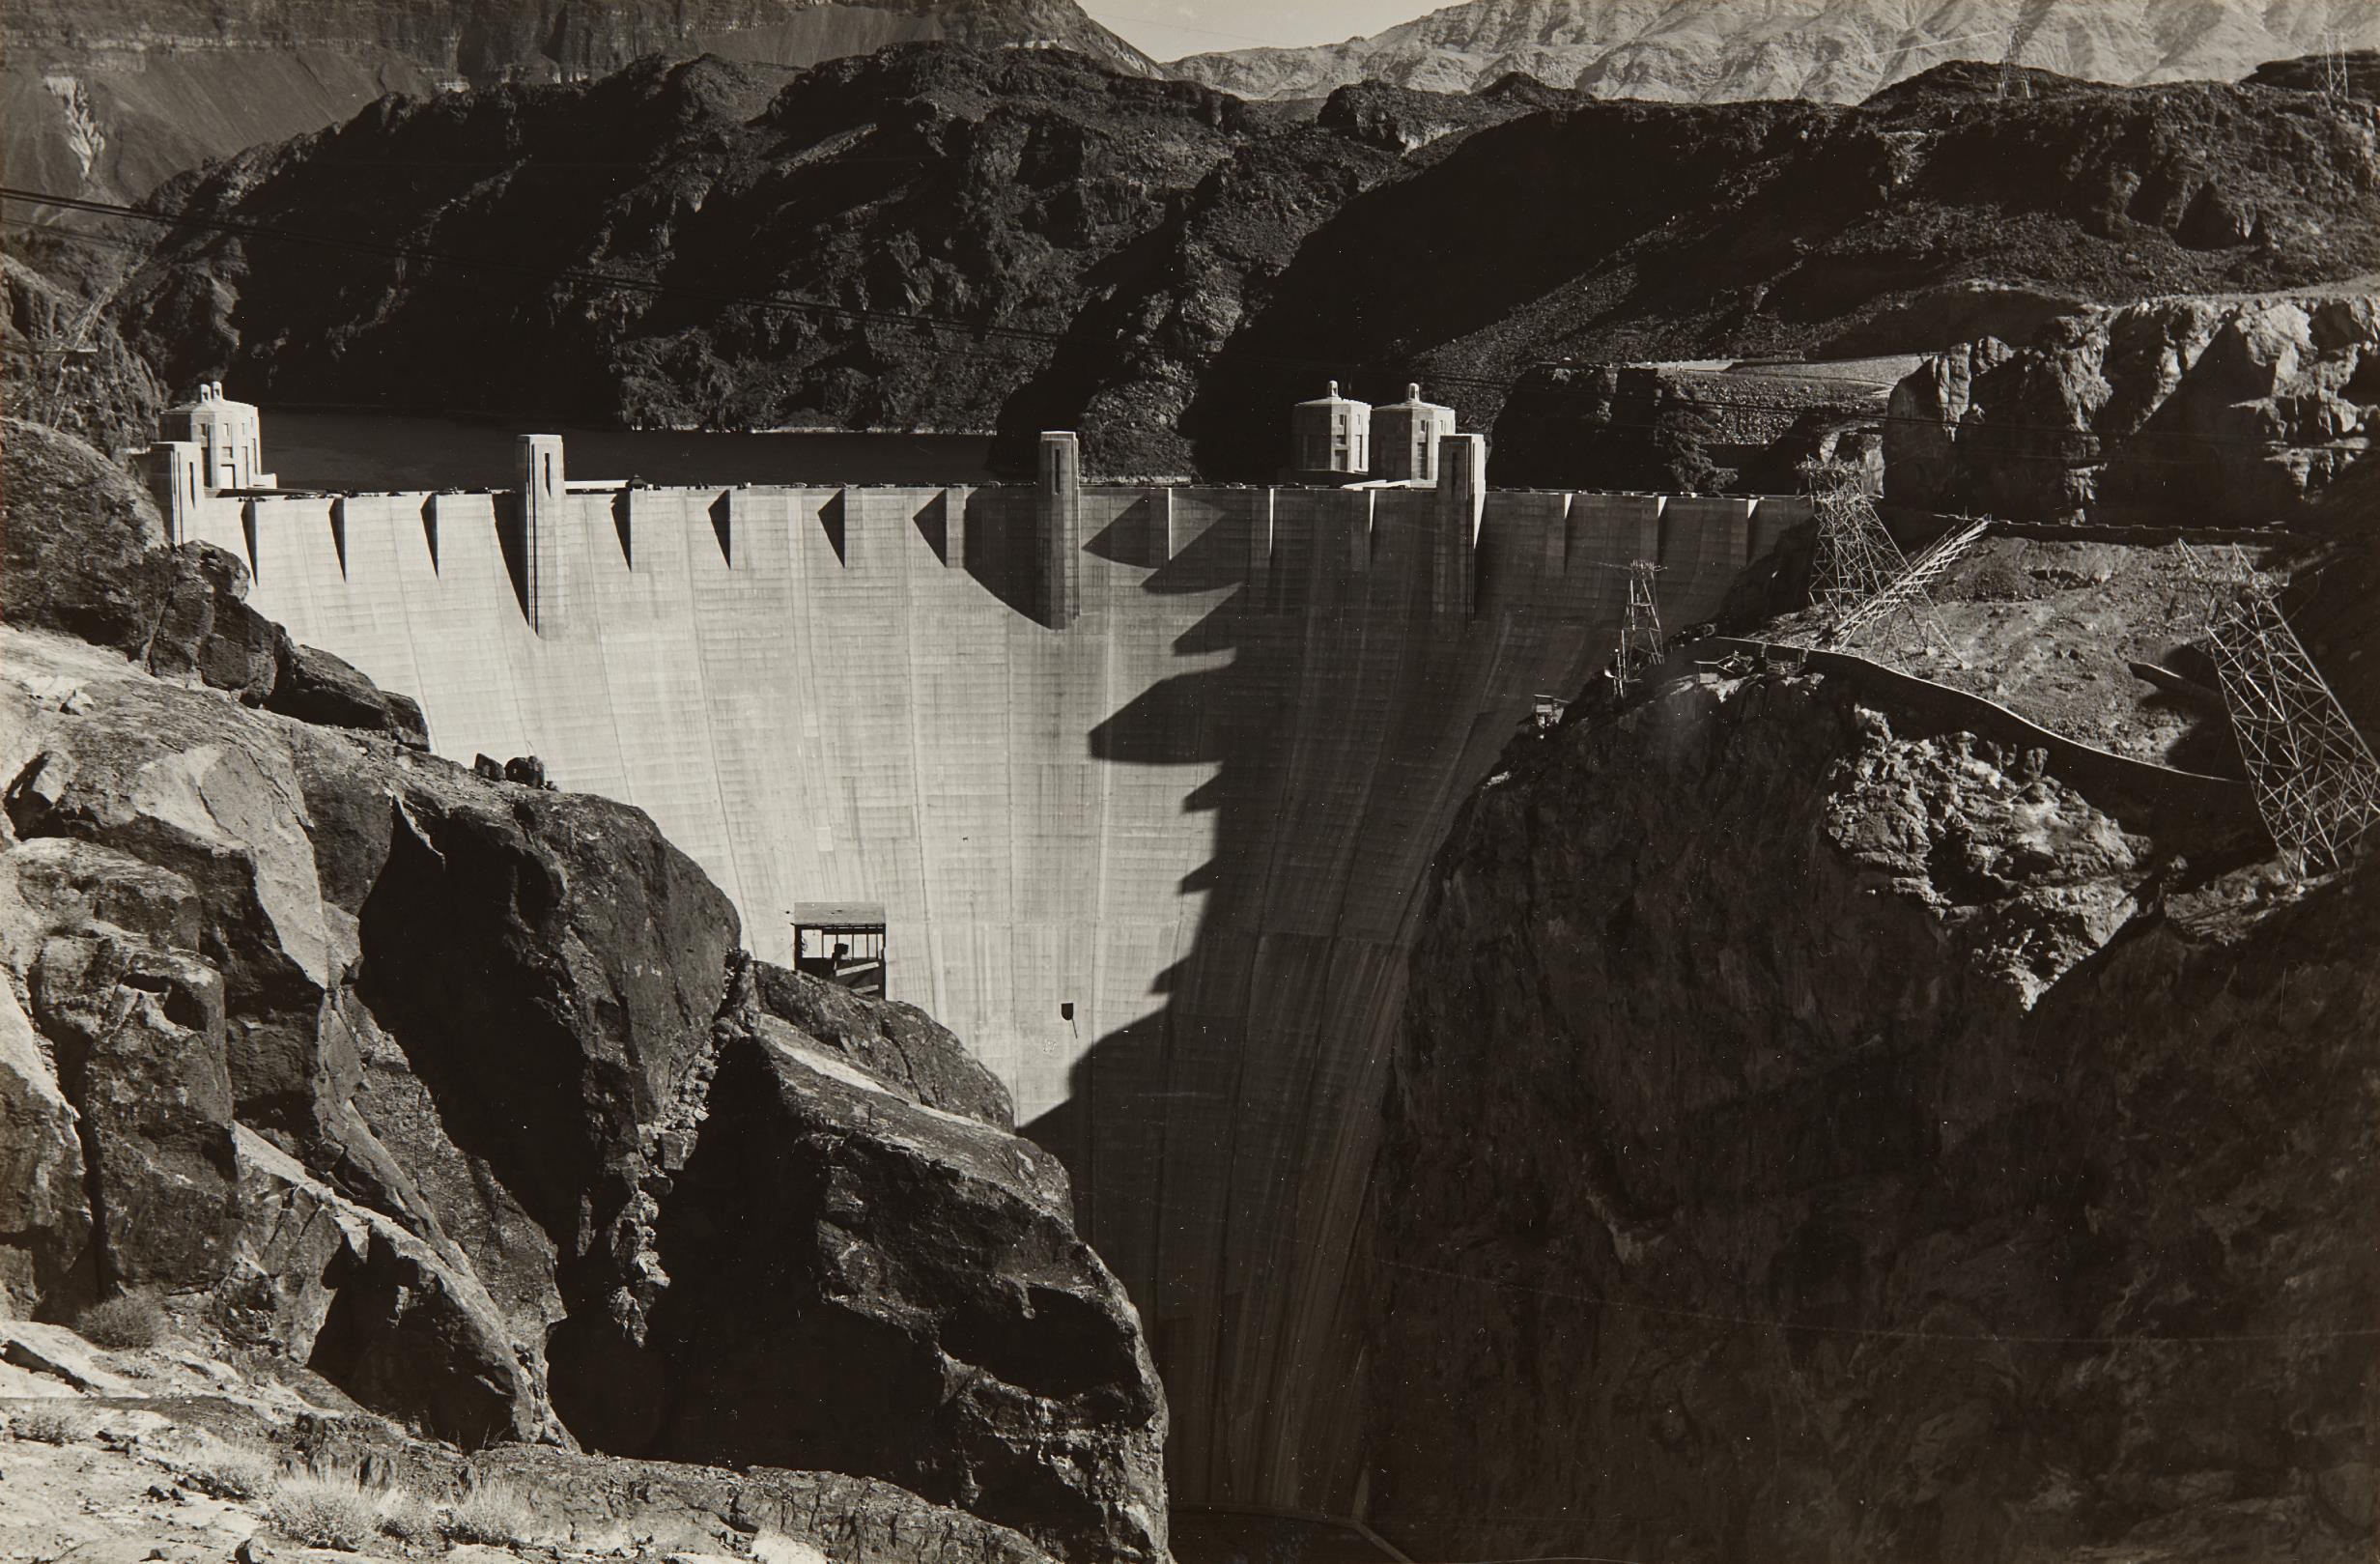 Charles Sheeler-Boulder Dam-1939